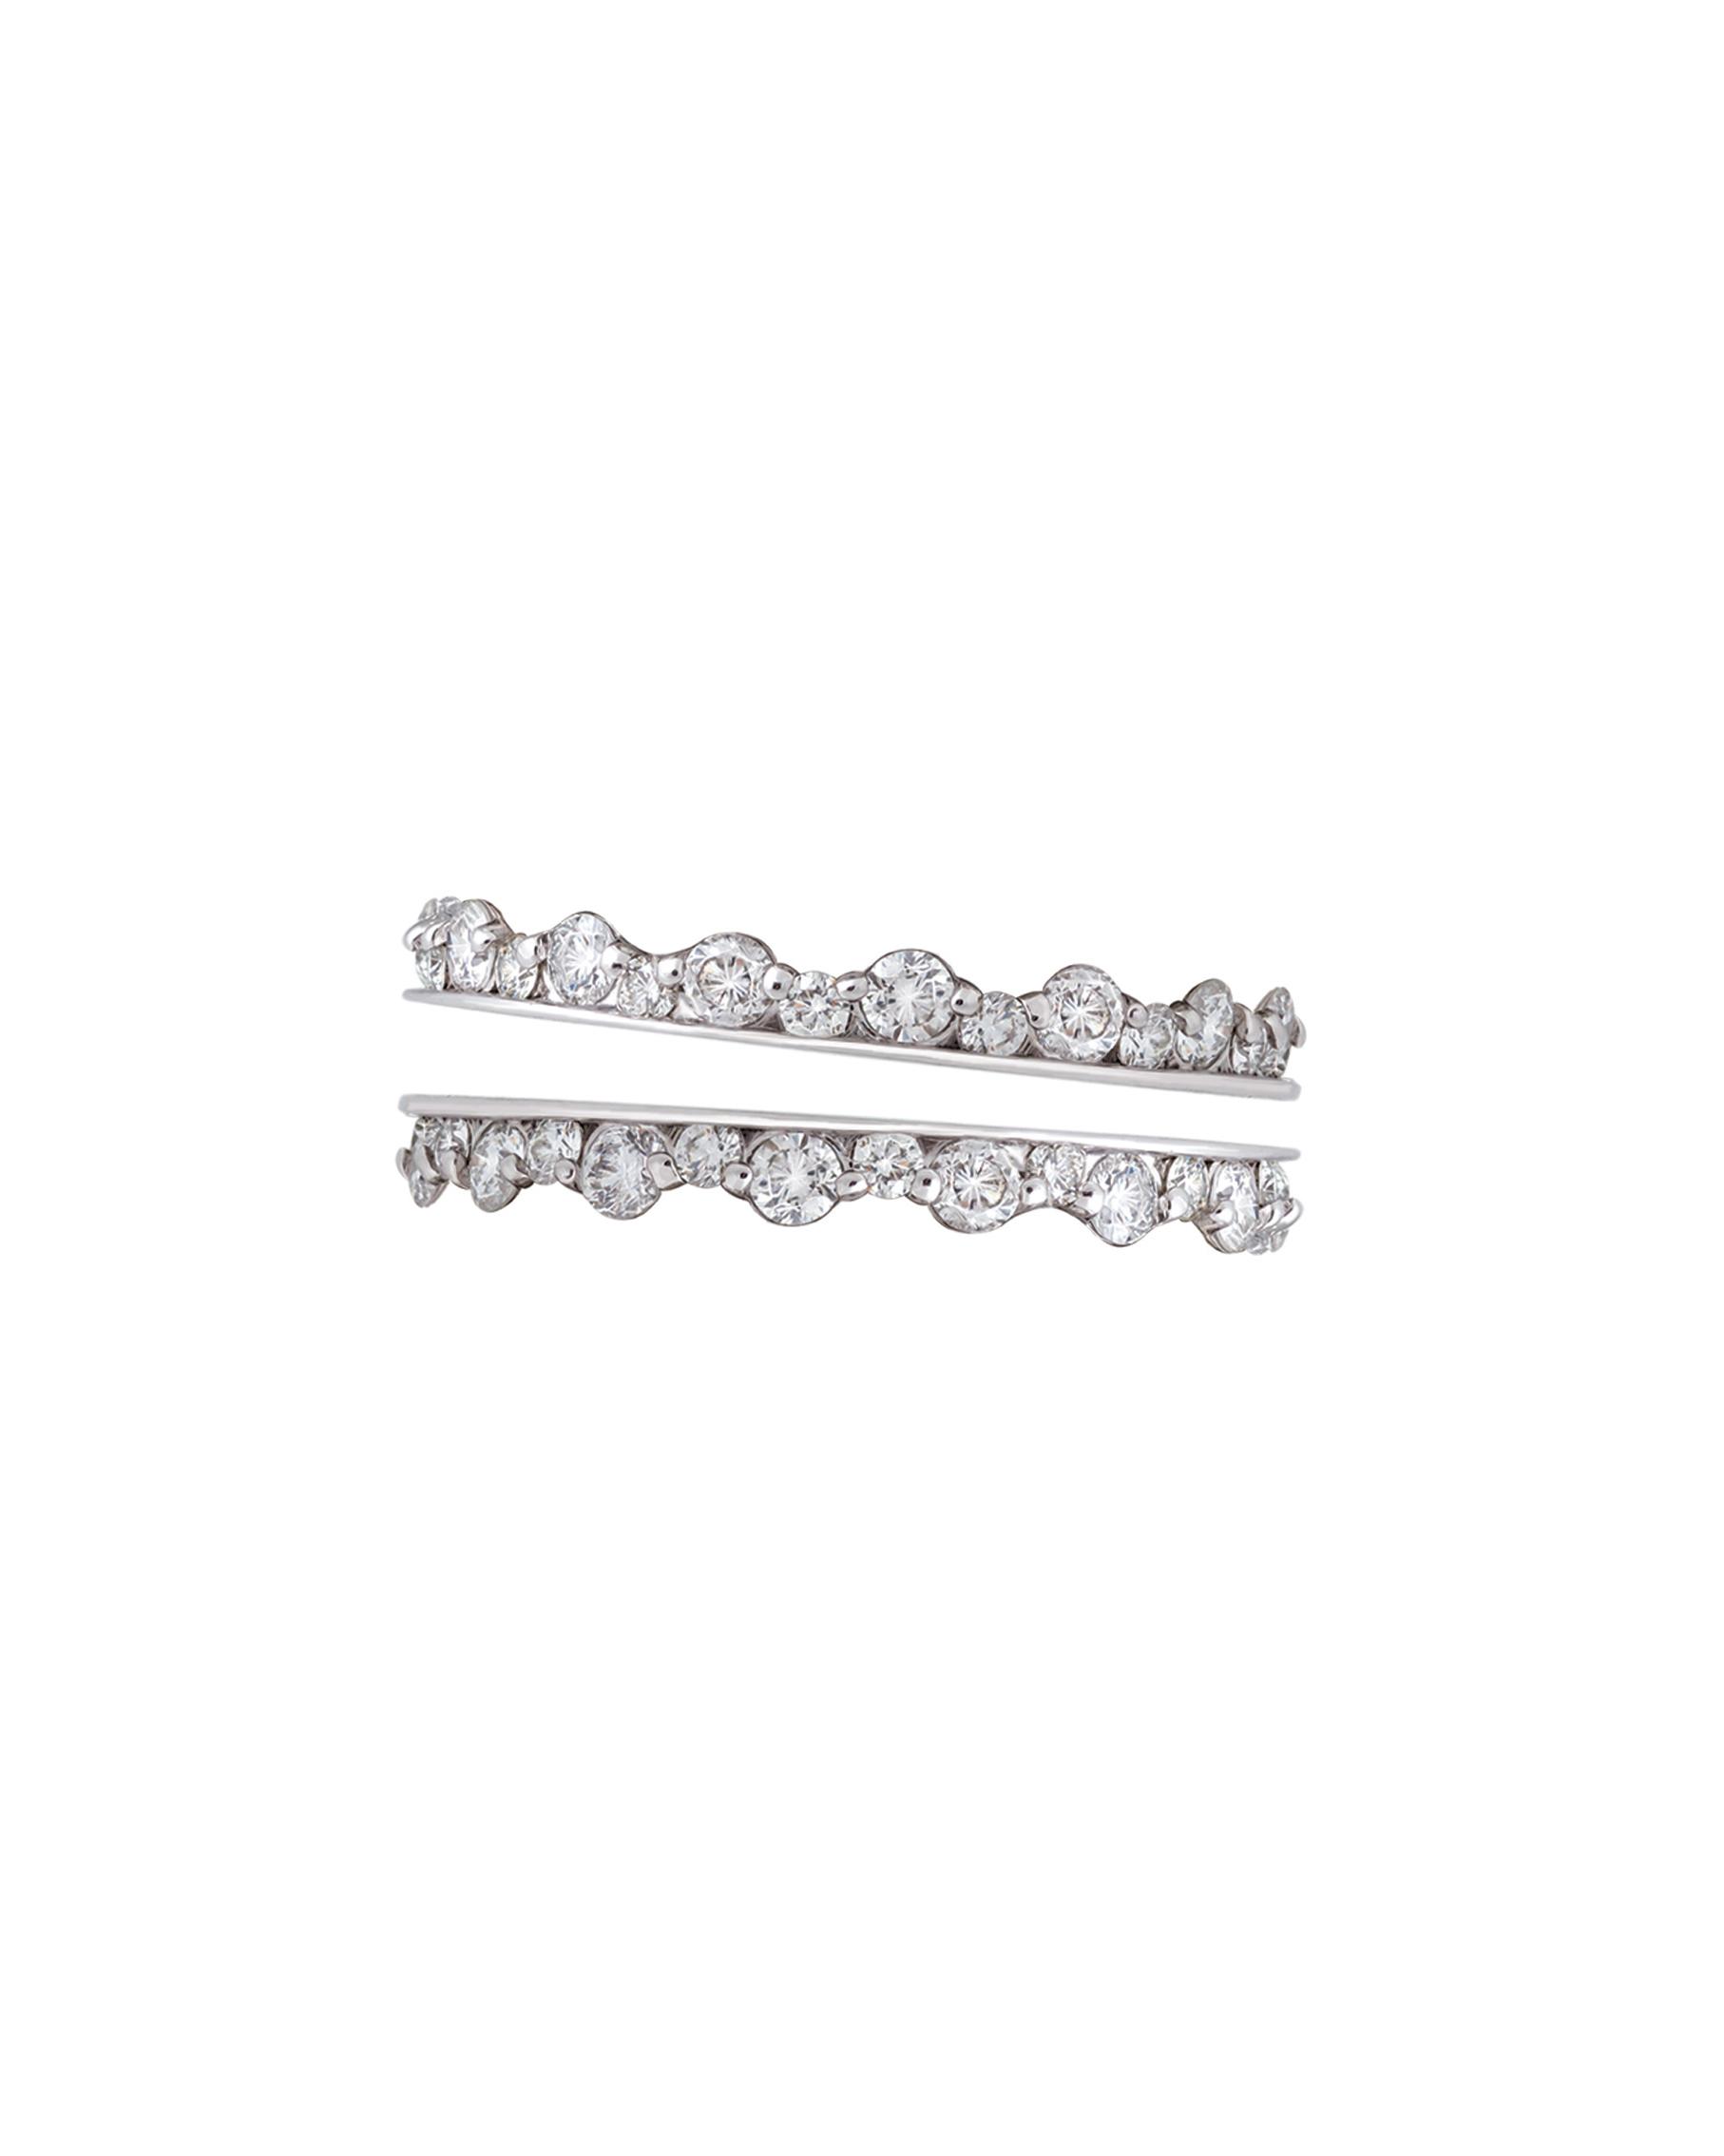 designer diamond bridal jewelry-4.jpg